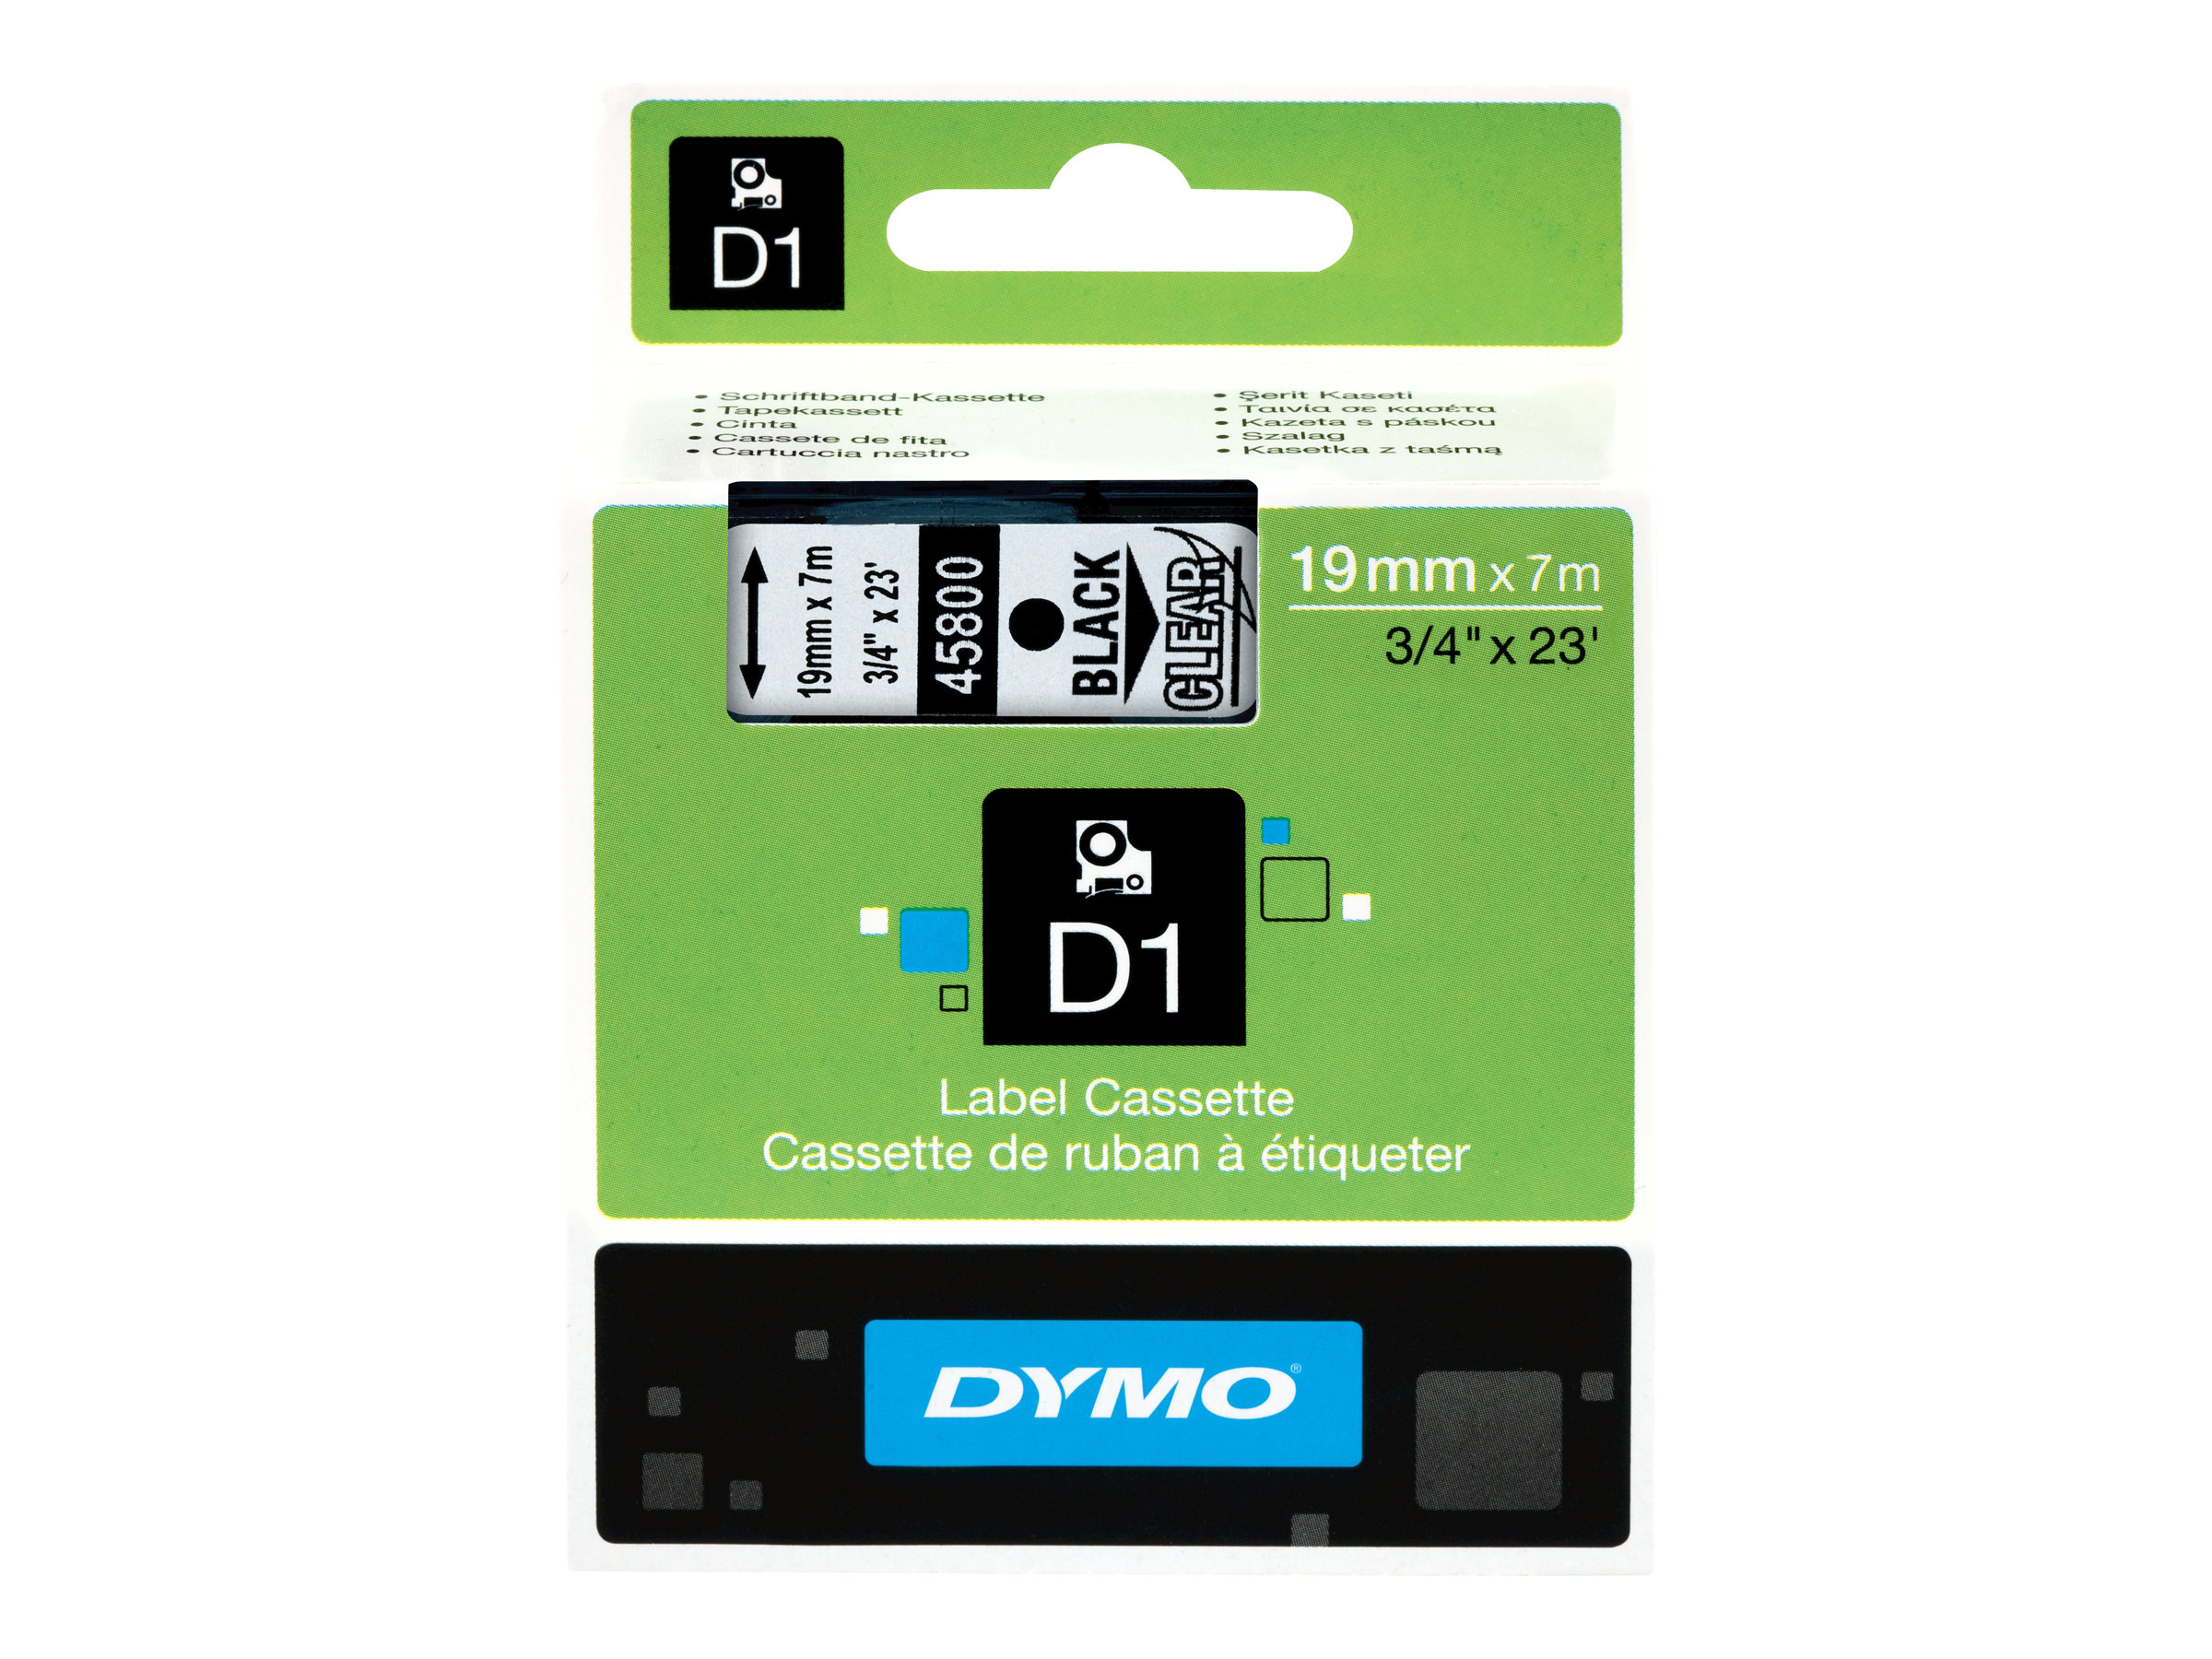 Dymo d1 selbstklebend schwarz auf transparent rolle 1 9 cm x 7 m 1 rolle n etikettenband fuer labelmanager 360 400 420 450 500 pc pc2 wireless pnp labelpoint 300 350 196758 s0720820